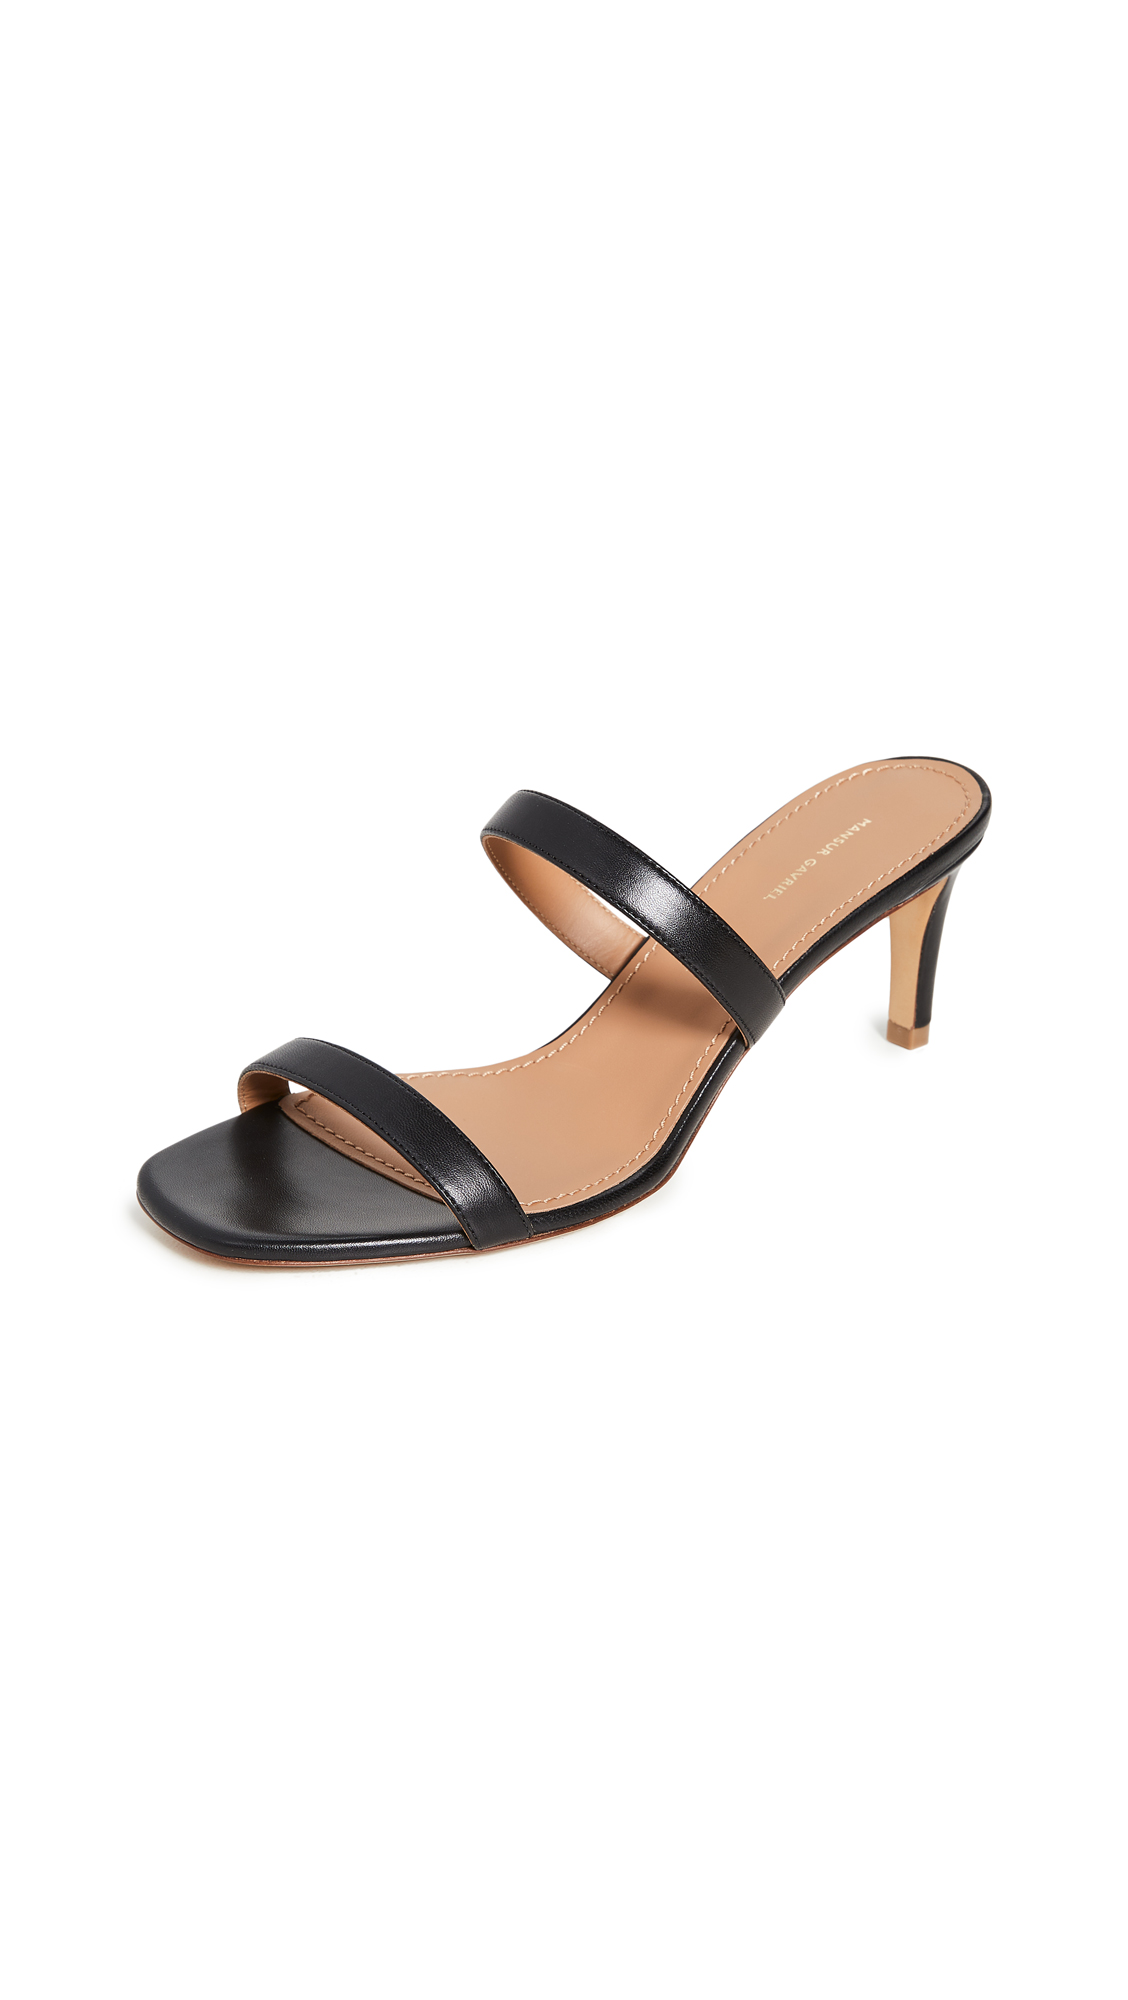 Mansur Gavriel Fino Sandals - 40% Off Sale